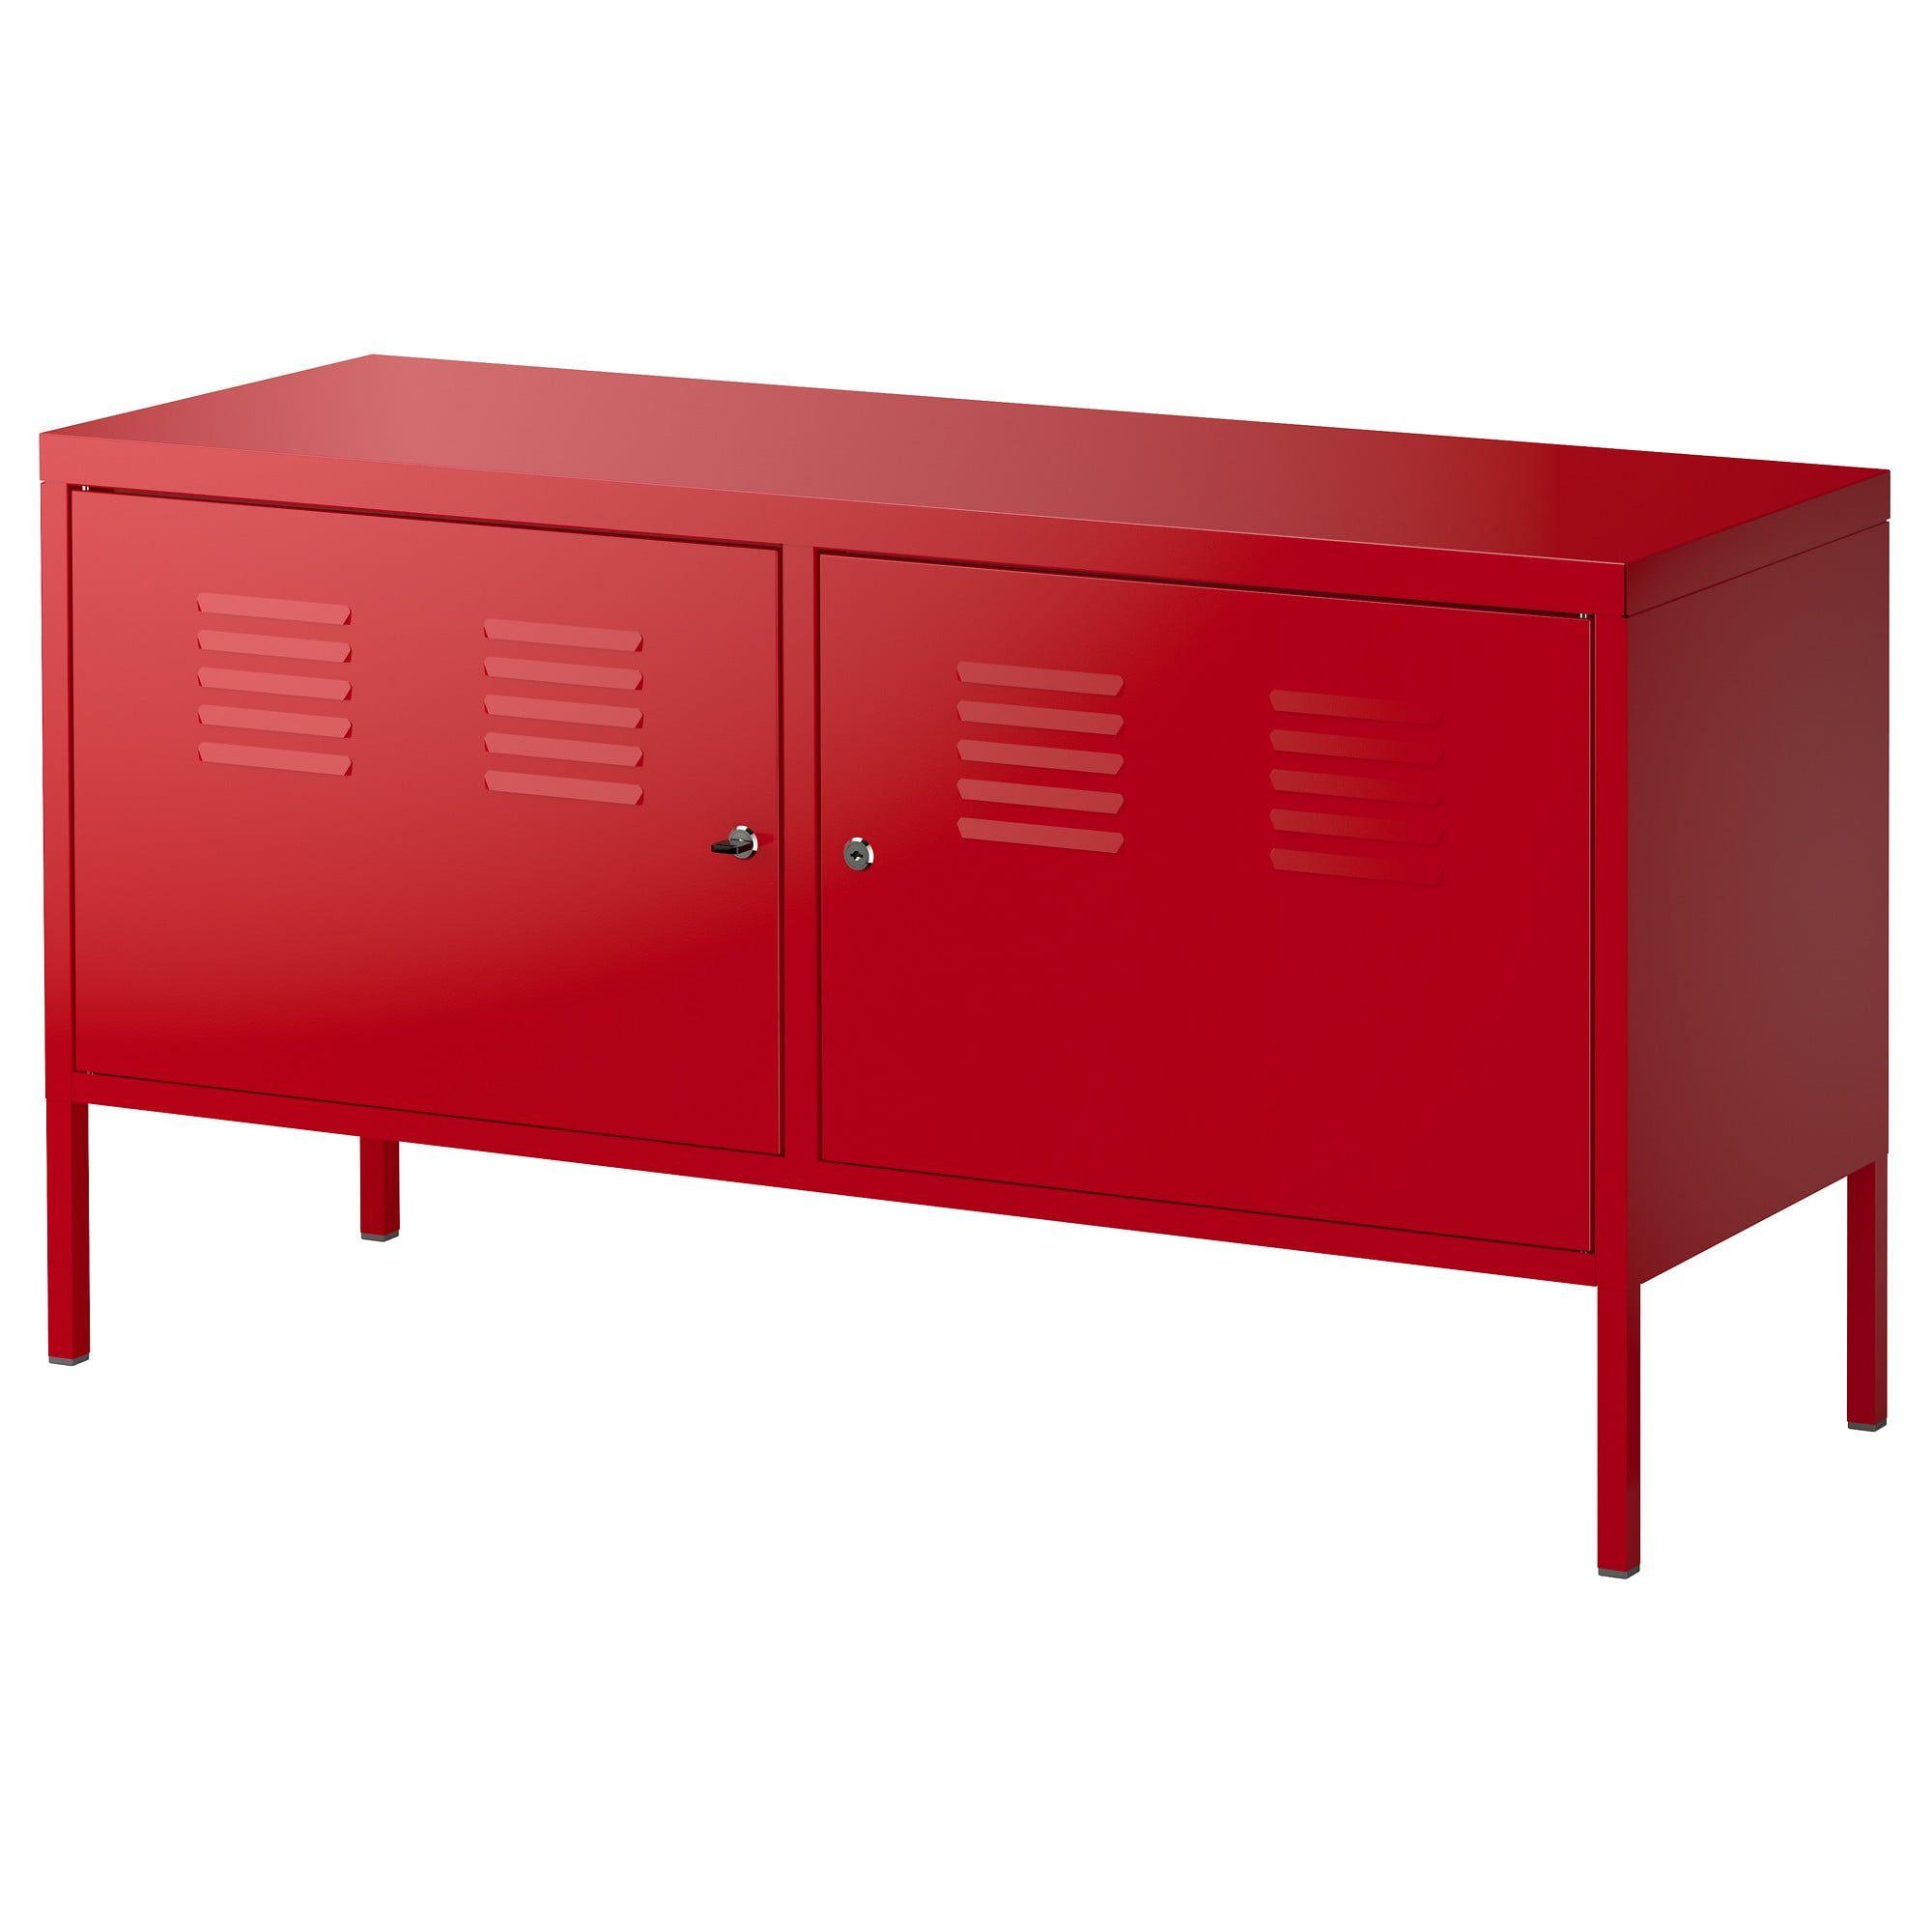 Ikea Ps Cabinet Red 46 7 8x24 3 4 Ikea Armoire Ikea Ps Ps Ikea Armoire Metallique